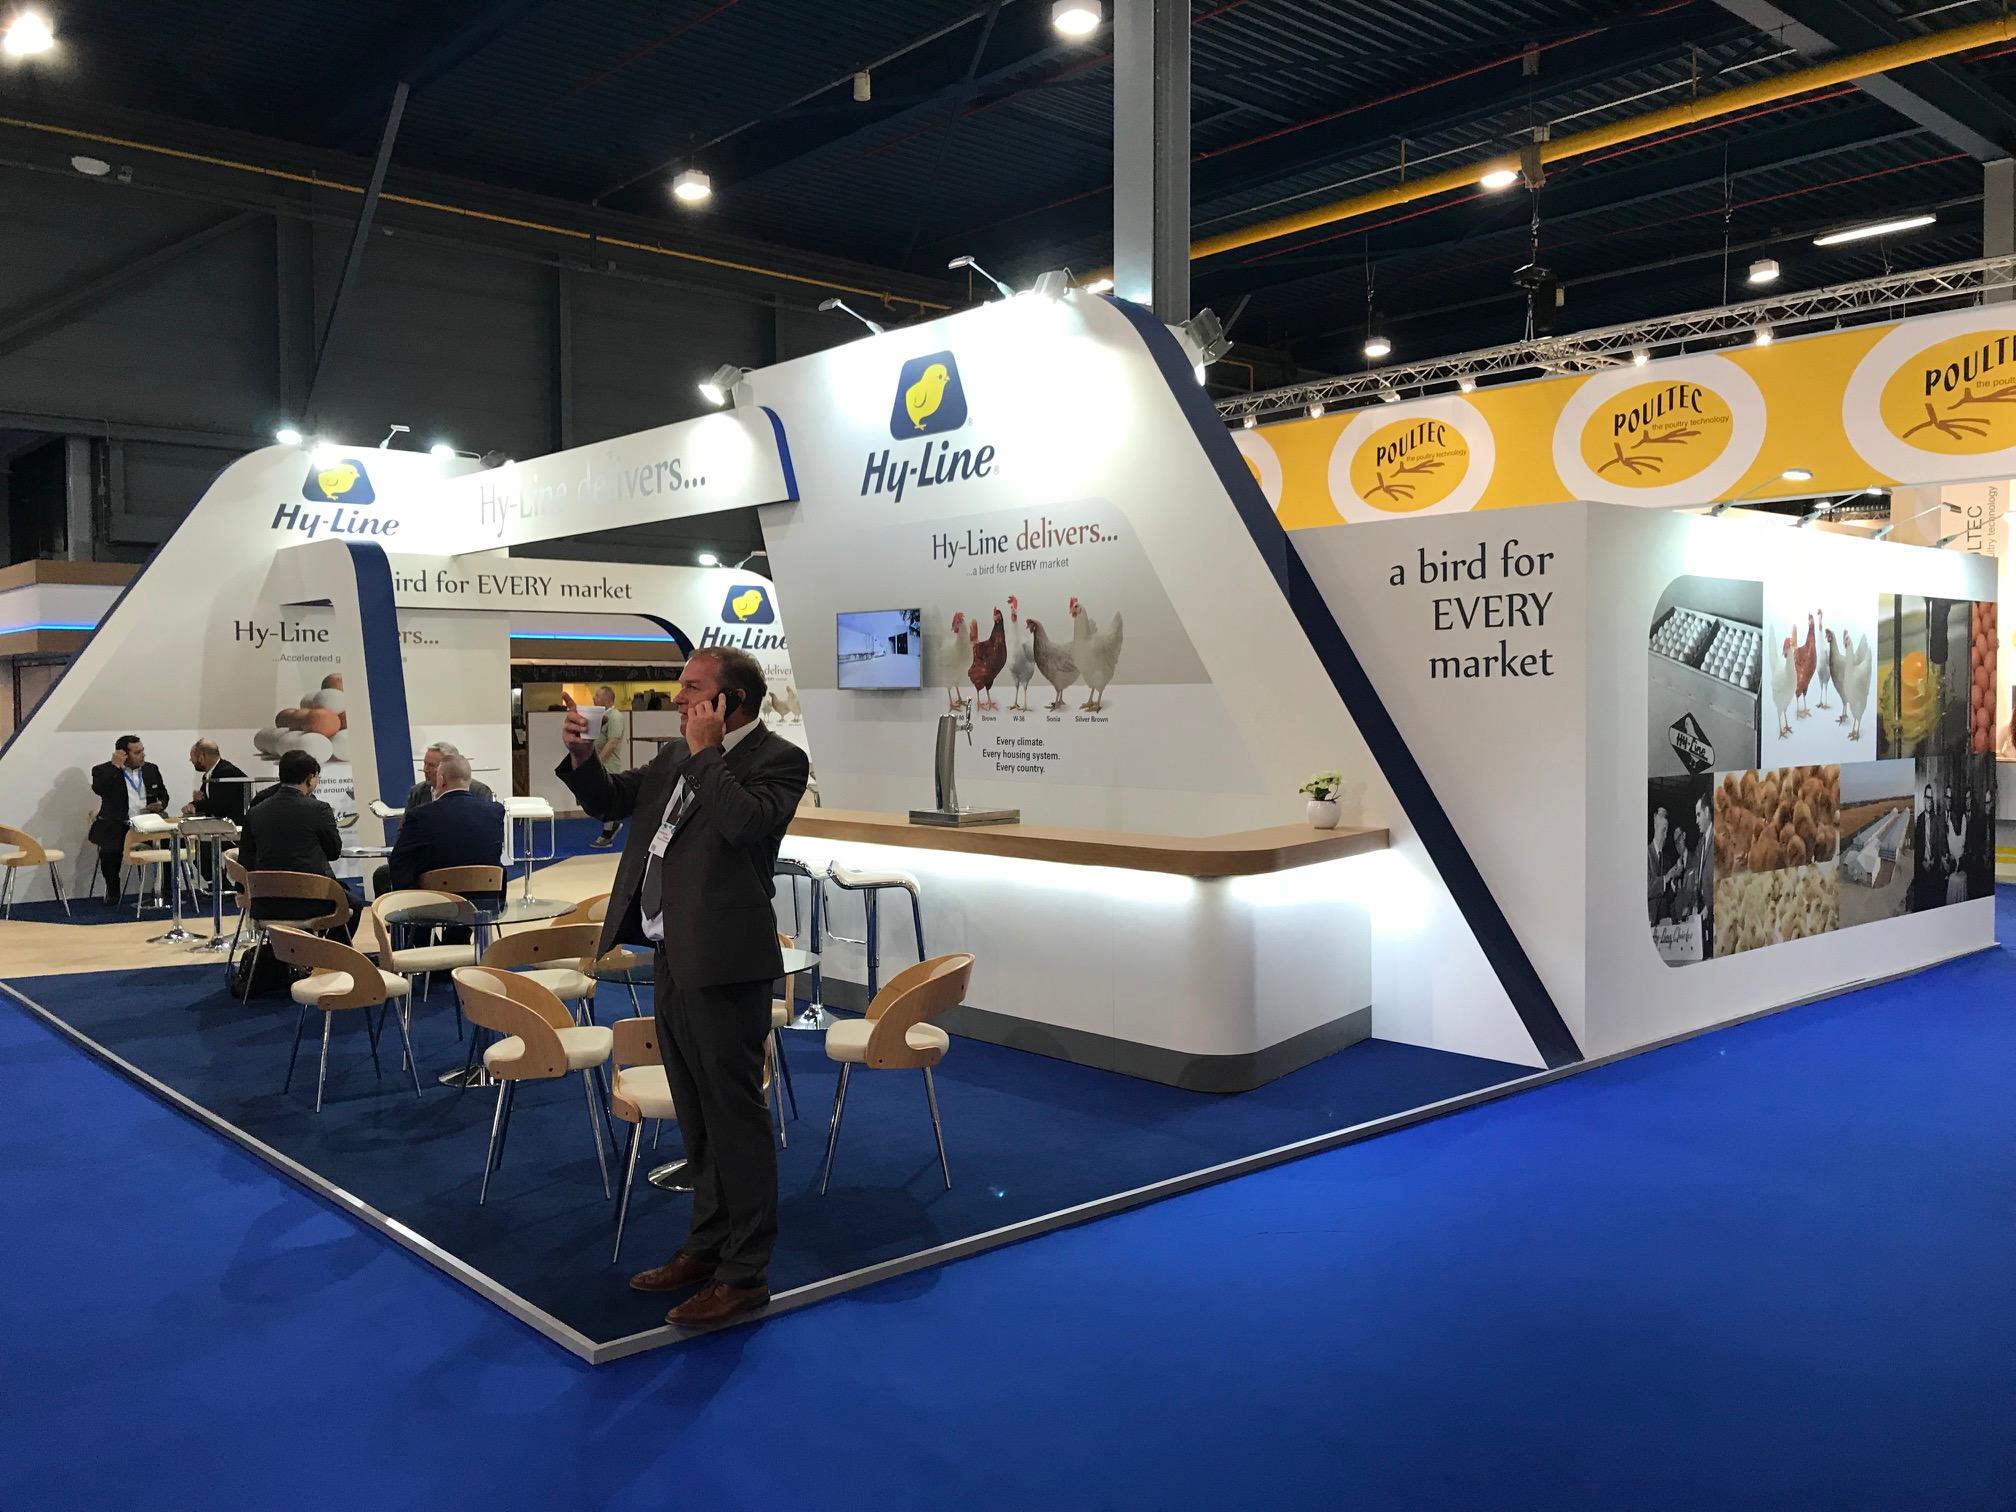 Custom built exhibition stand for Hy-Line at VIV Europe 2018 Jaarbeurs Utrecht, The Netherlands